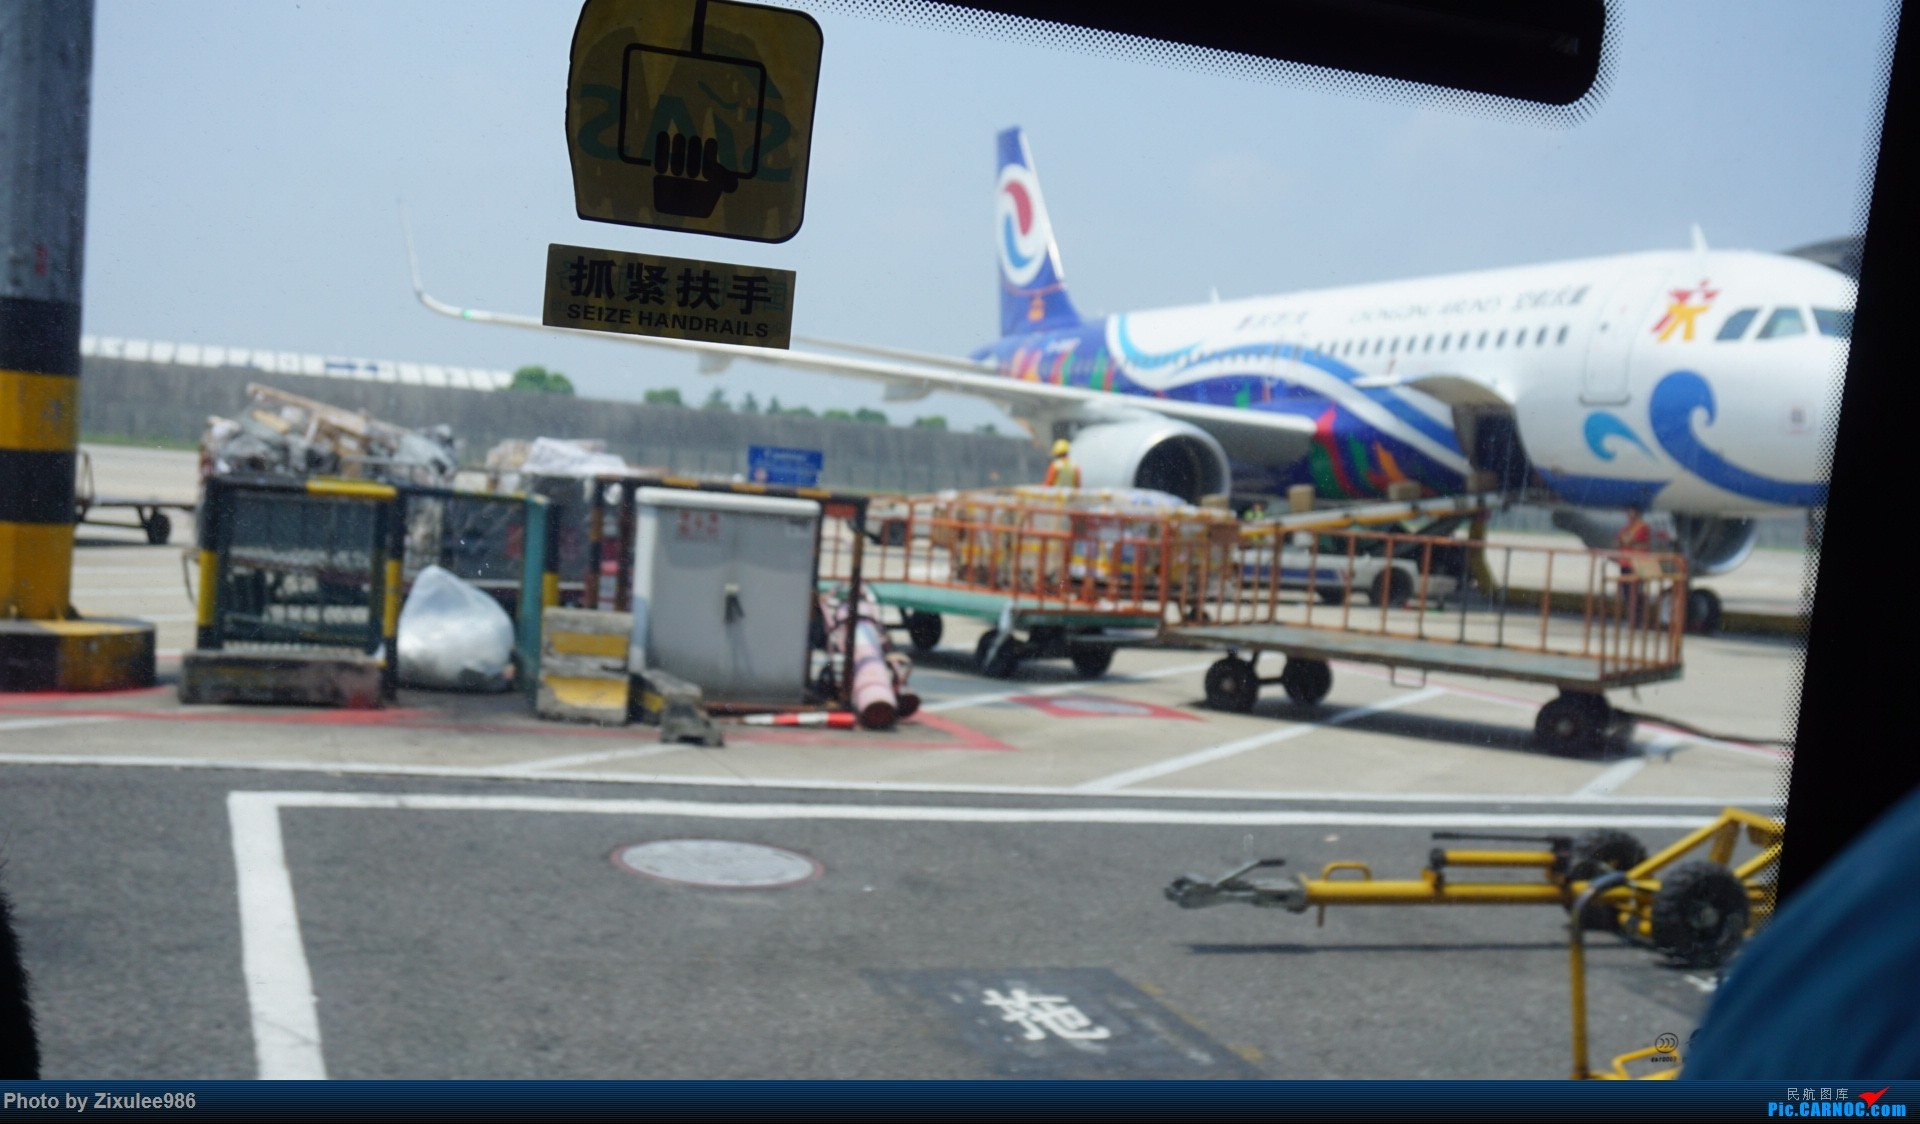 Re:[原创]加拿大21日游学之旅(一)~JJN-PVG-YYZ..(内含flightlog)~第一次发游记~多图缓更请谅解 AIRBUS A320-200  中国上海浦东国际机场